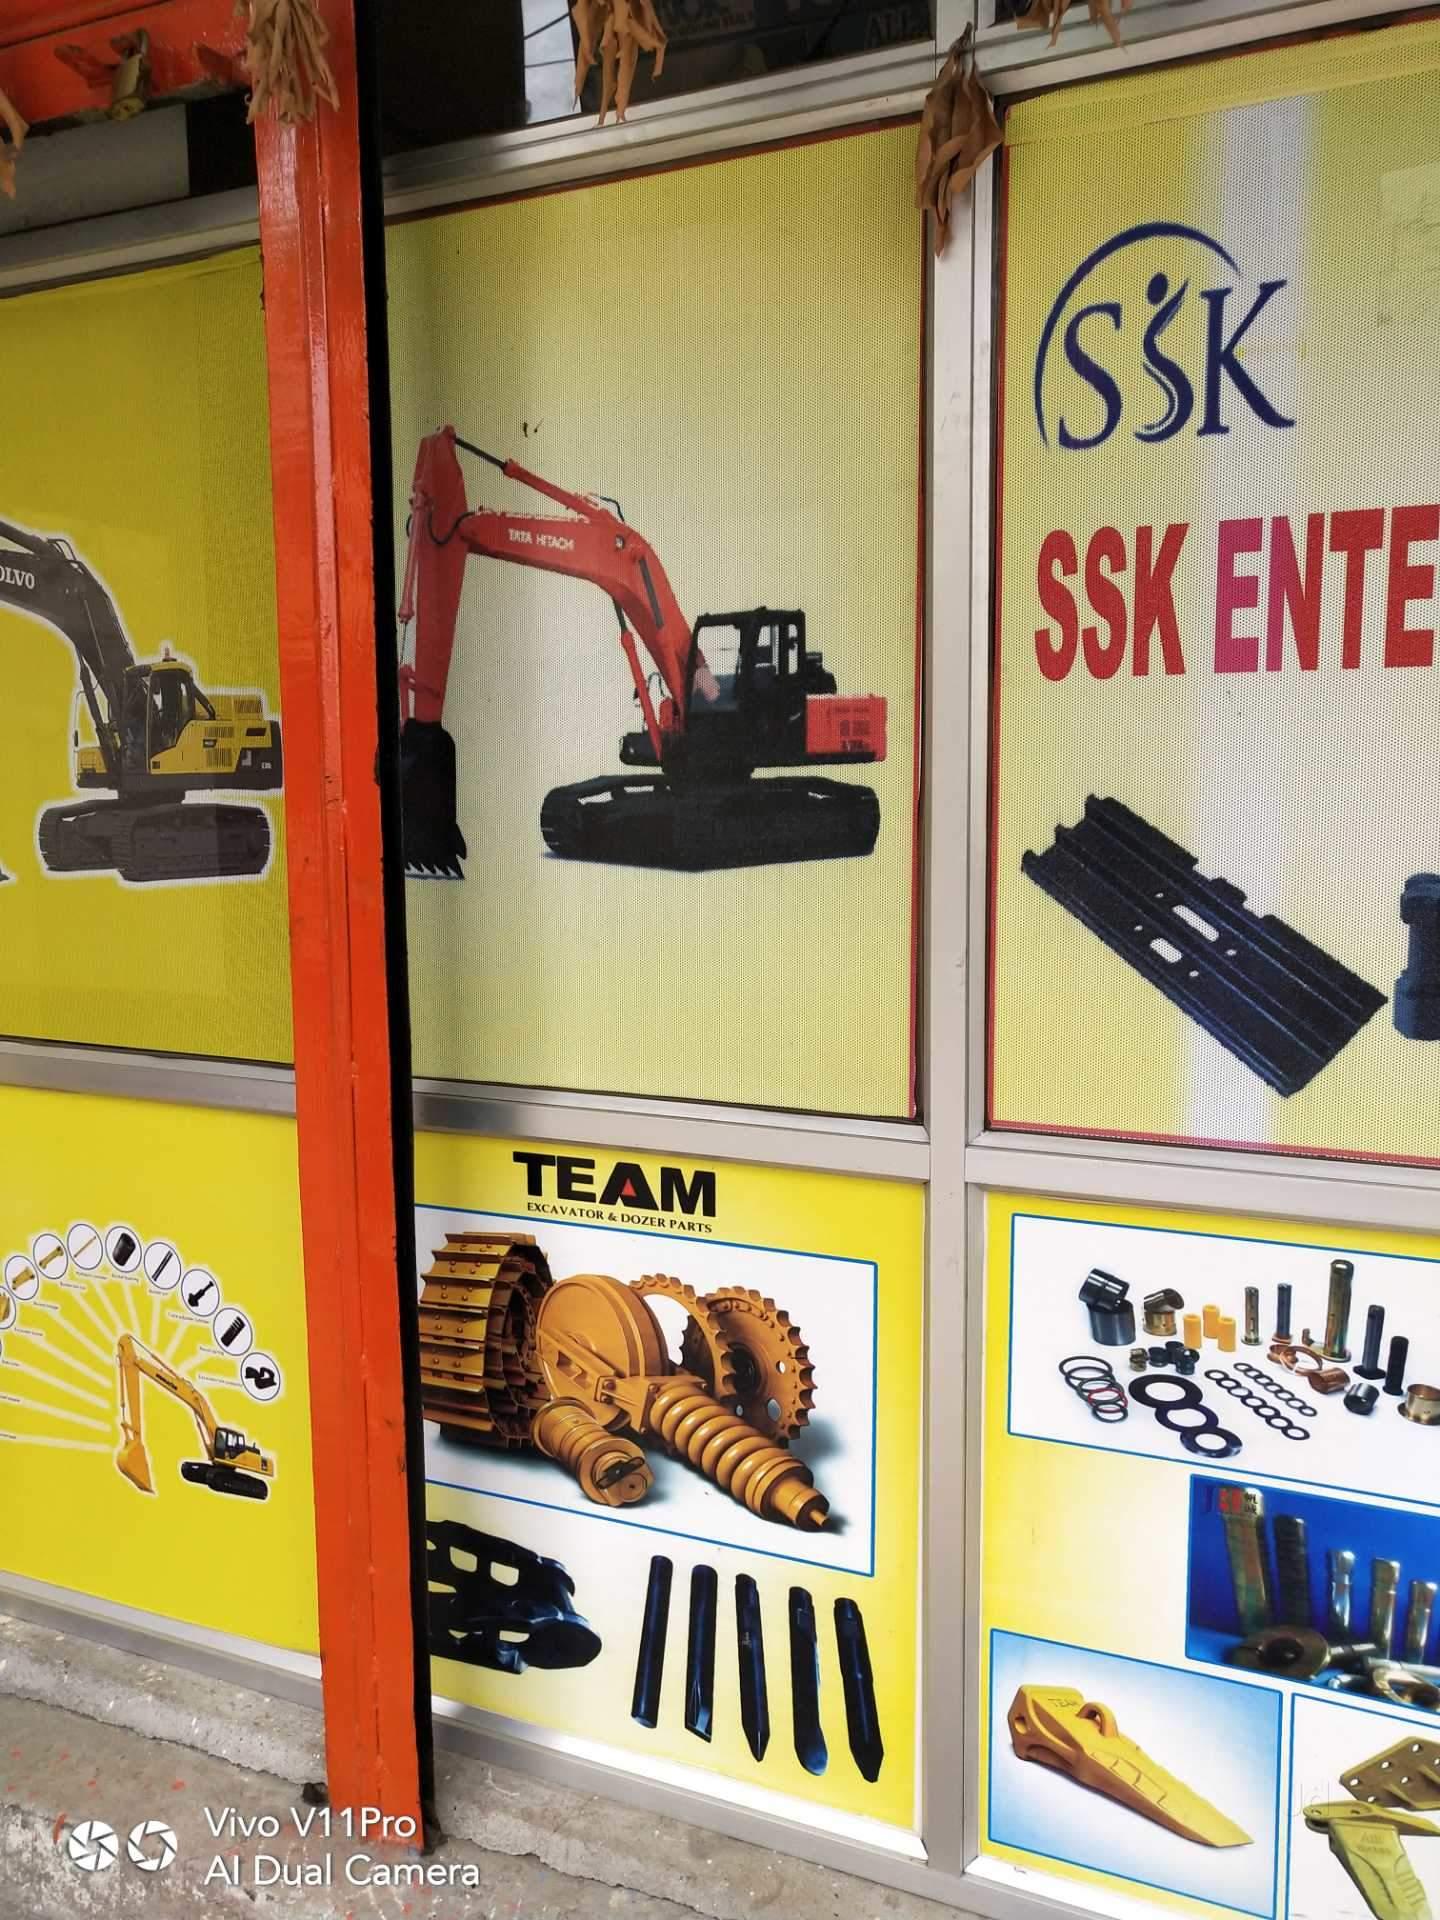 Top Excavator Spare Part Dealers in Karimnagar - Justdial